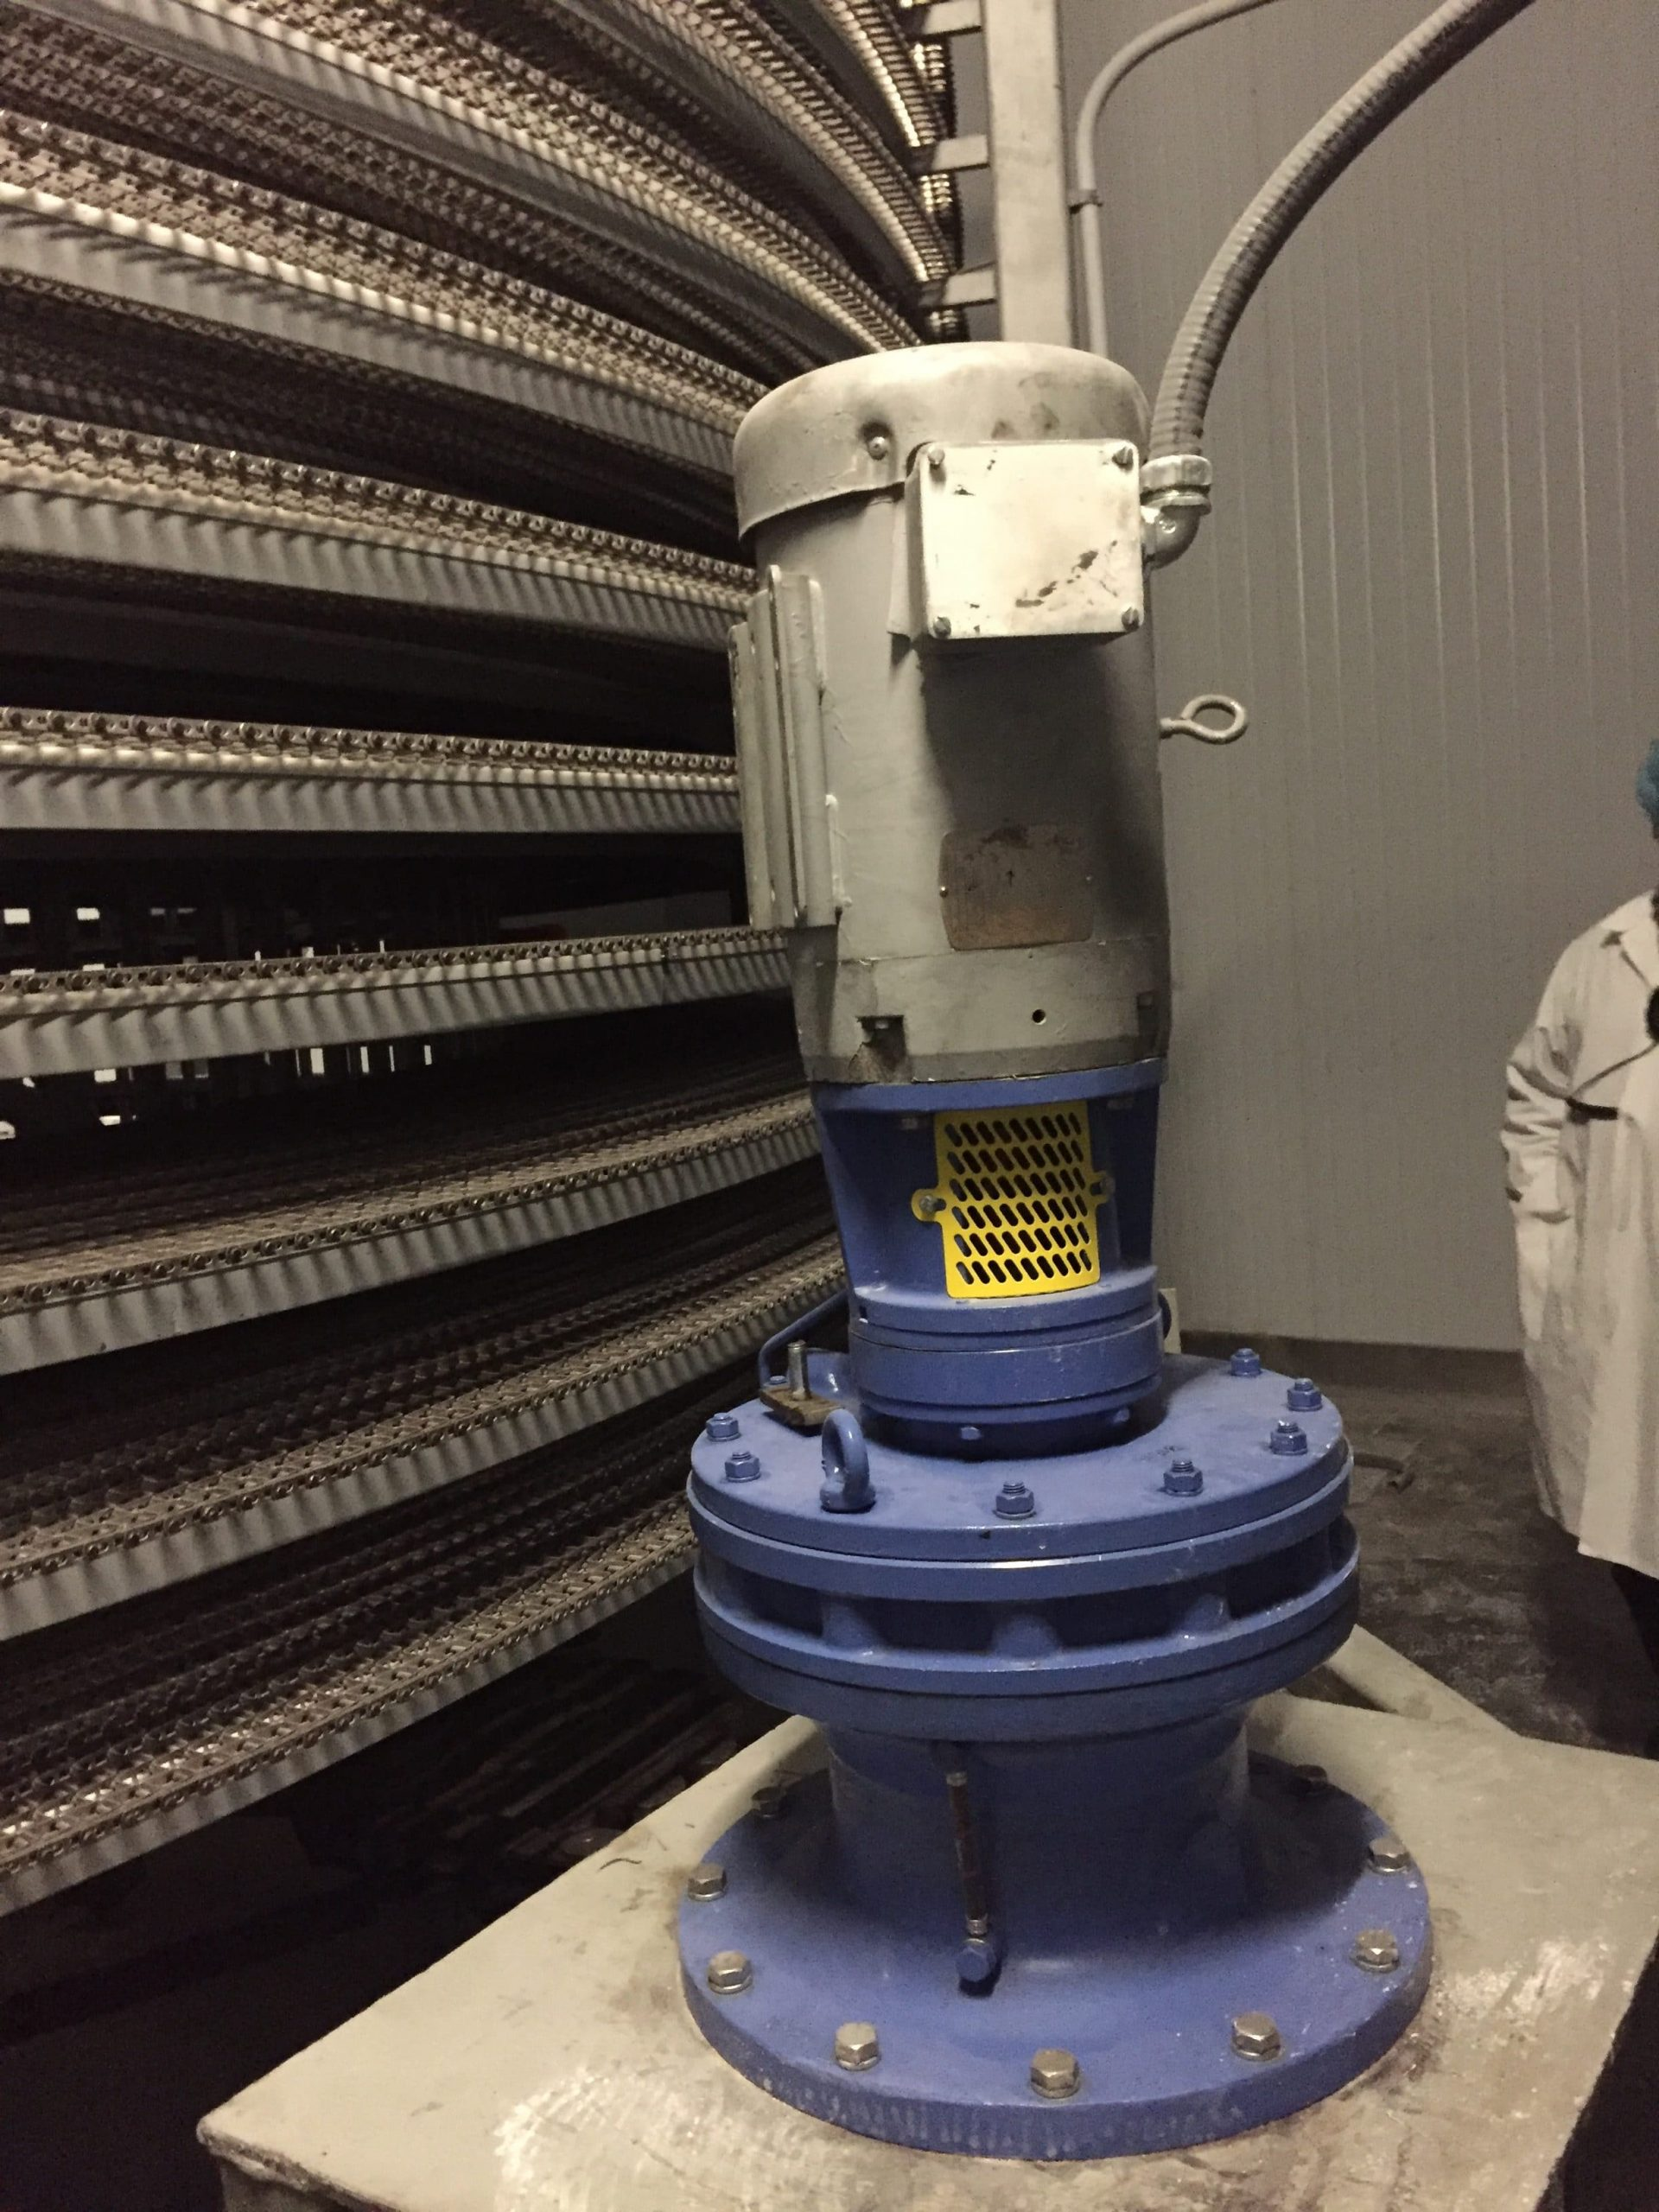 Spiral-Cooler-Freezer-1-e1512477757546-scaled-1.jpg